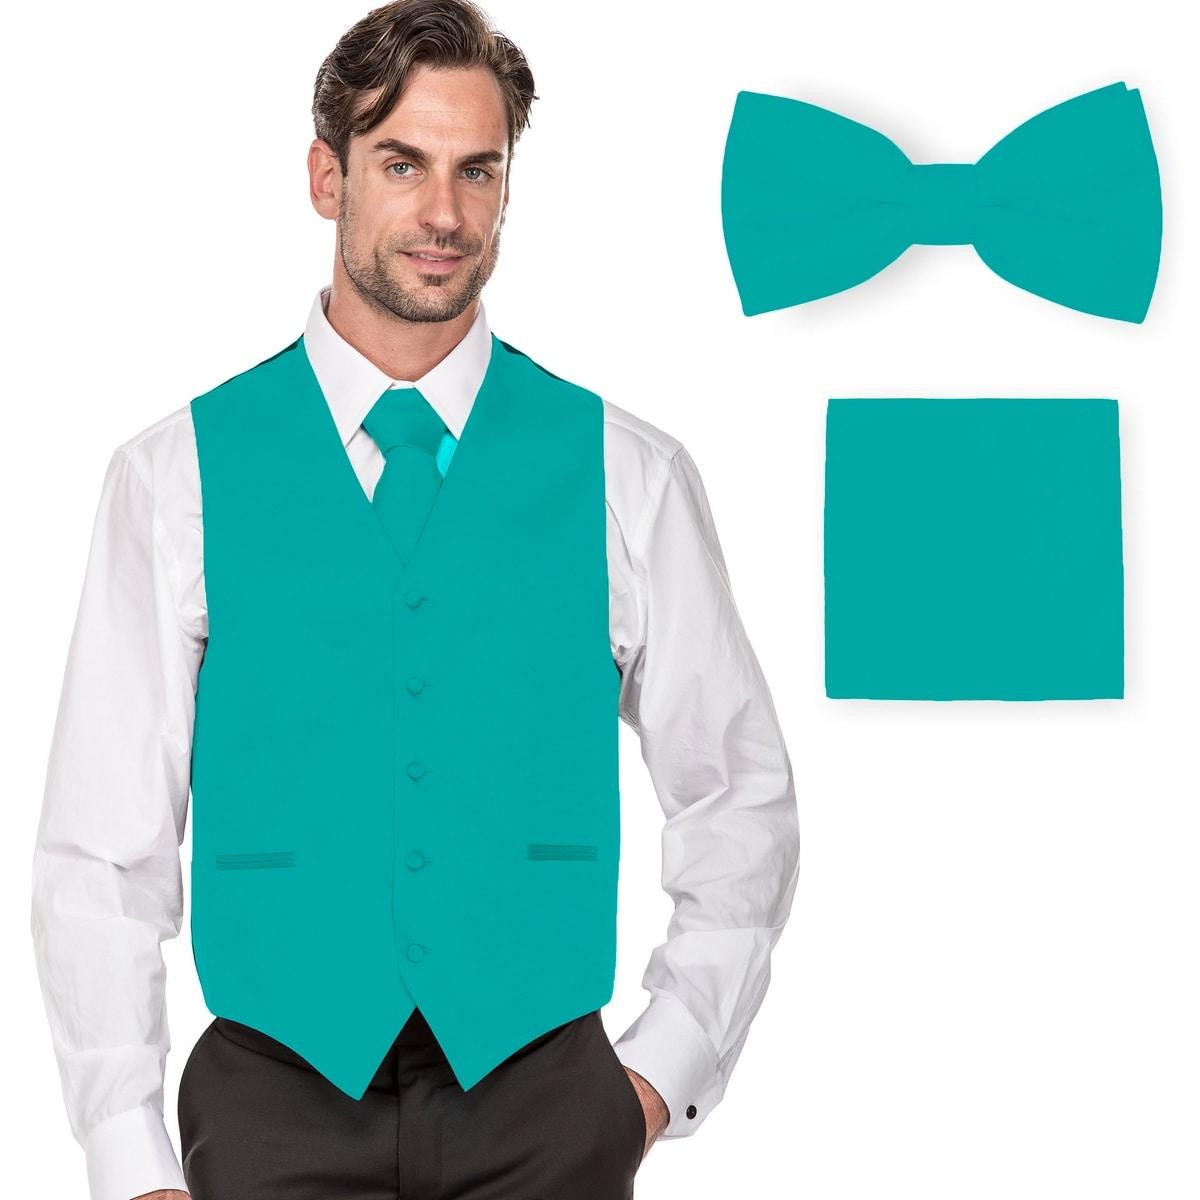 New Mens White Low Cut Tuxedo Vest Tie Set Open Back Formal Wedding Size 2XL